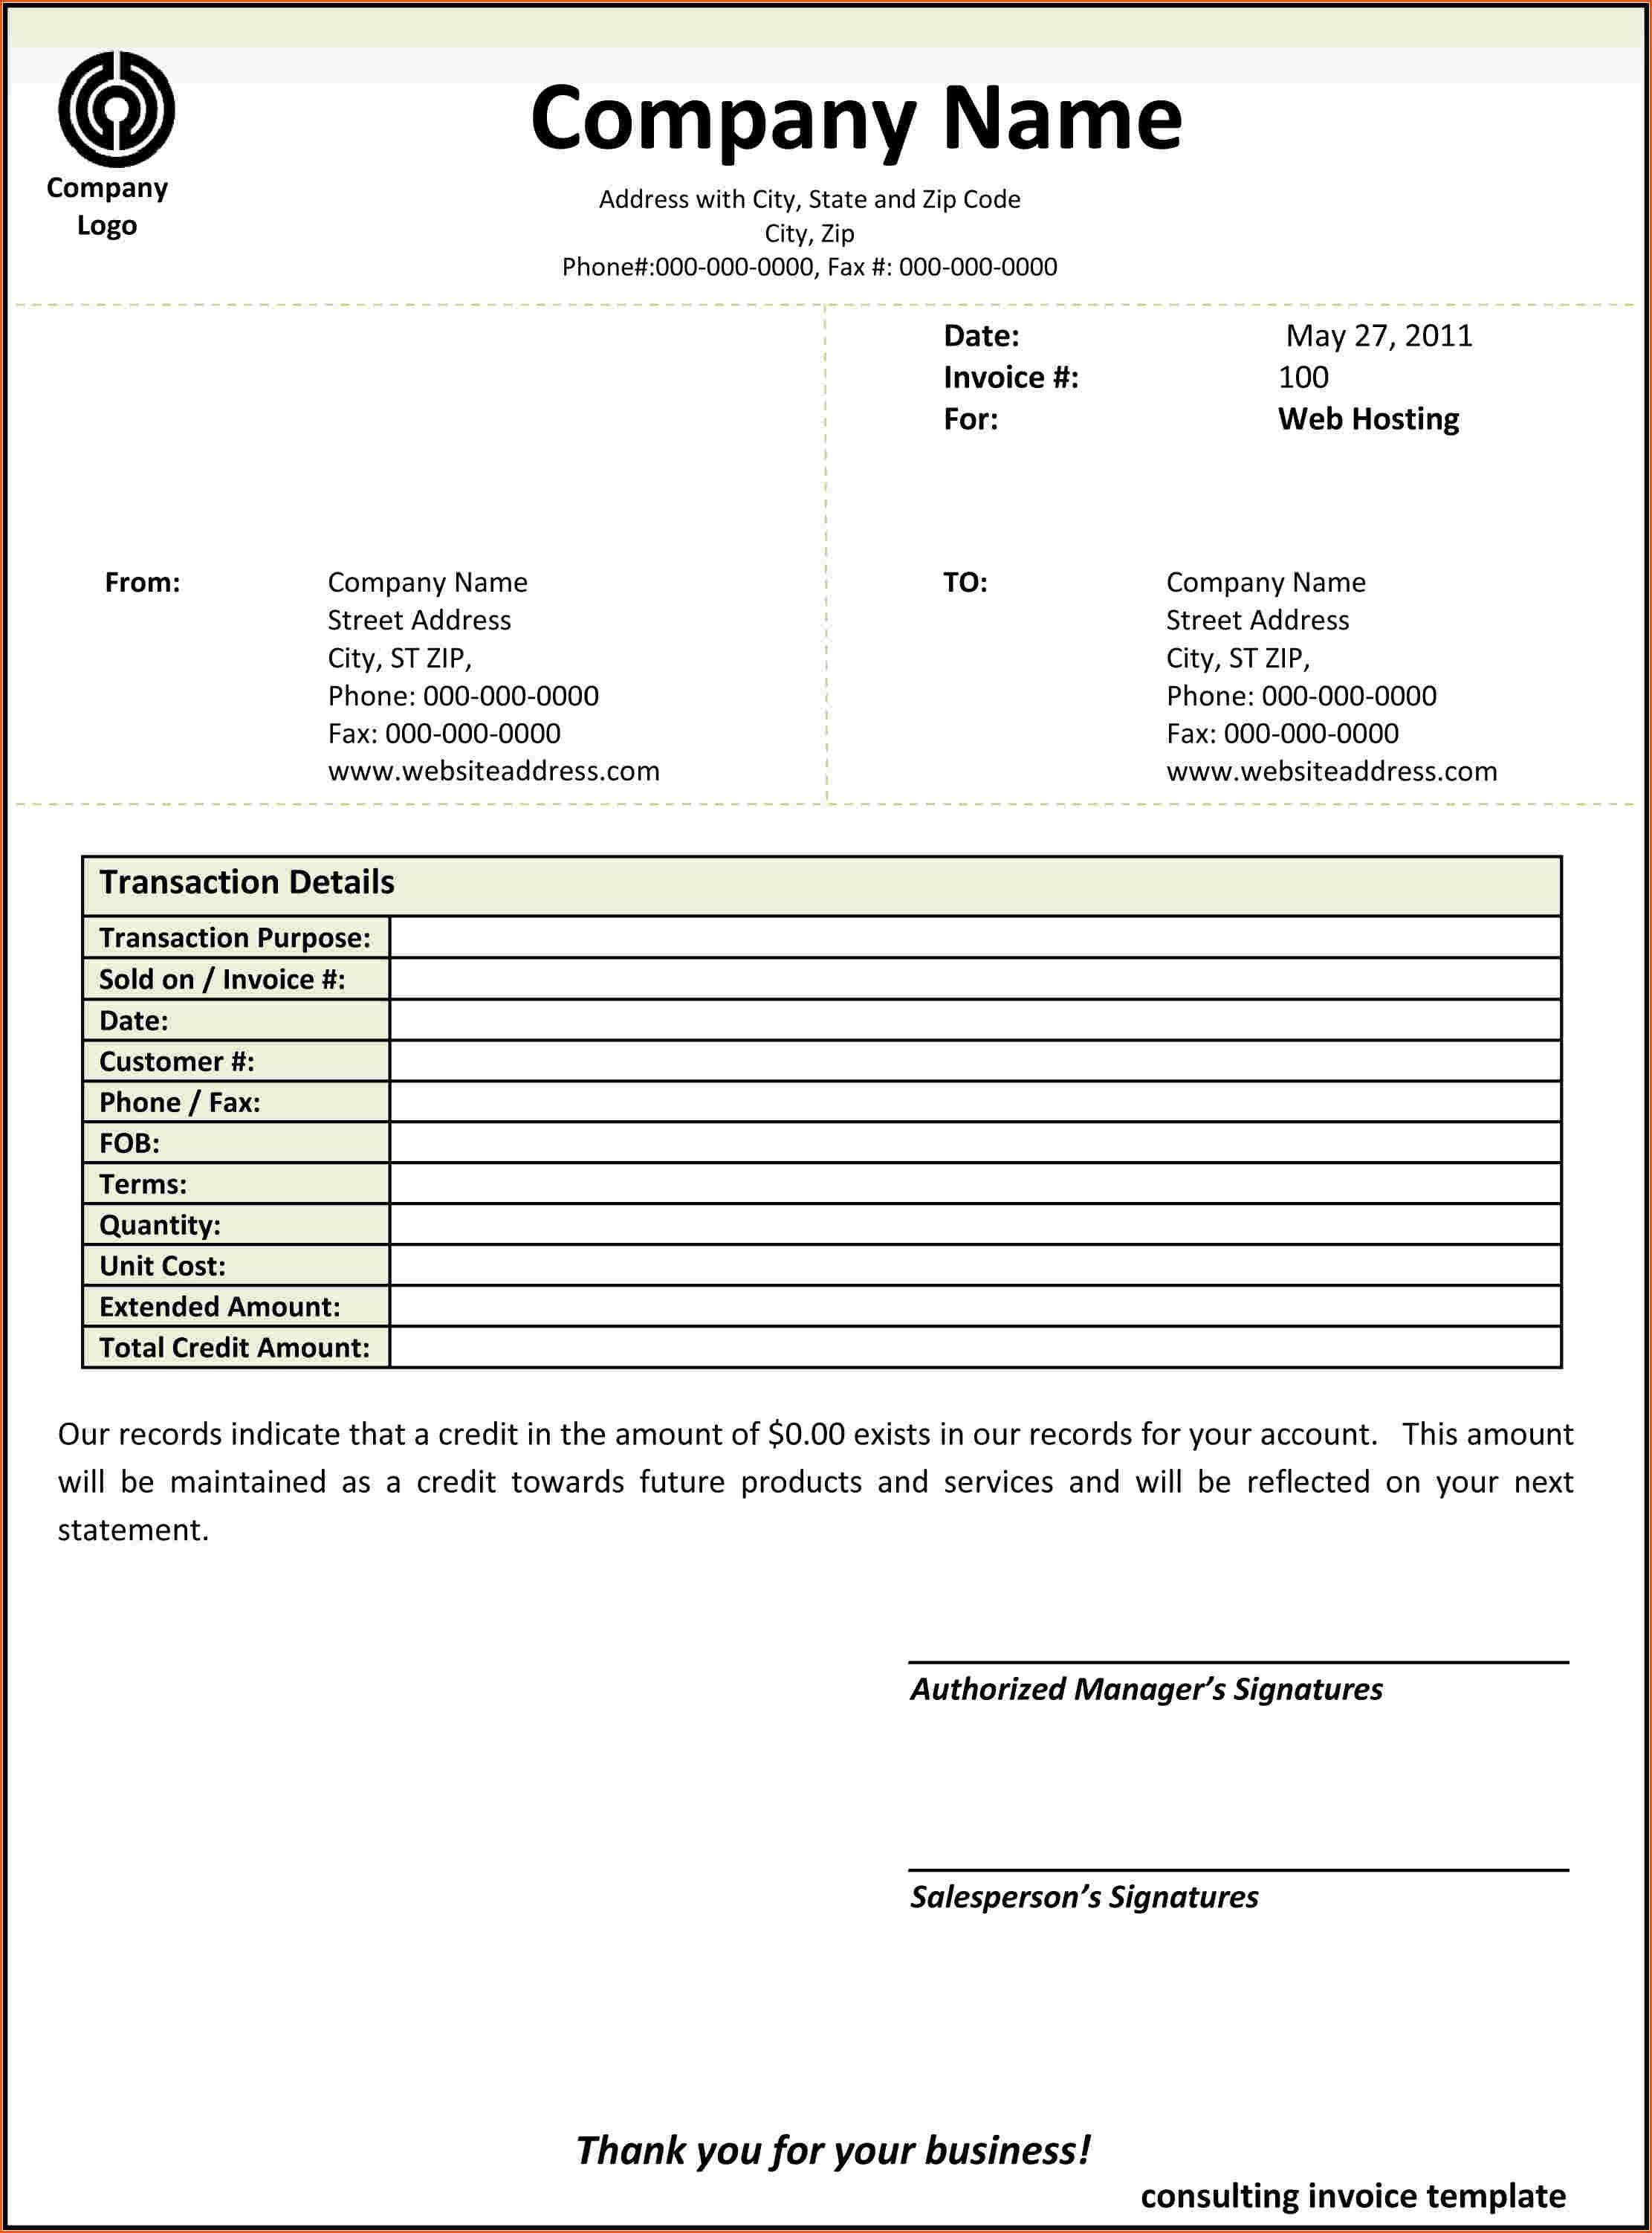 consultant invoice template consultant invoice template sample consultant invoice template 2223 X 3004